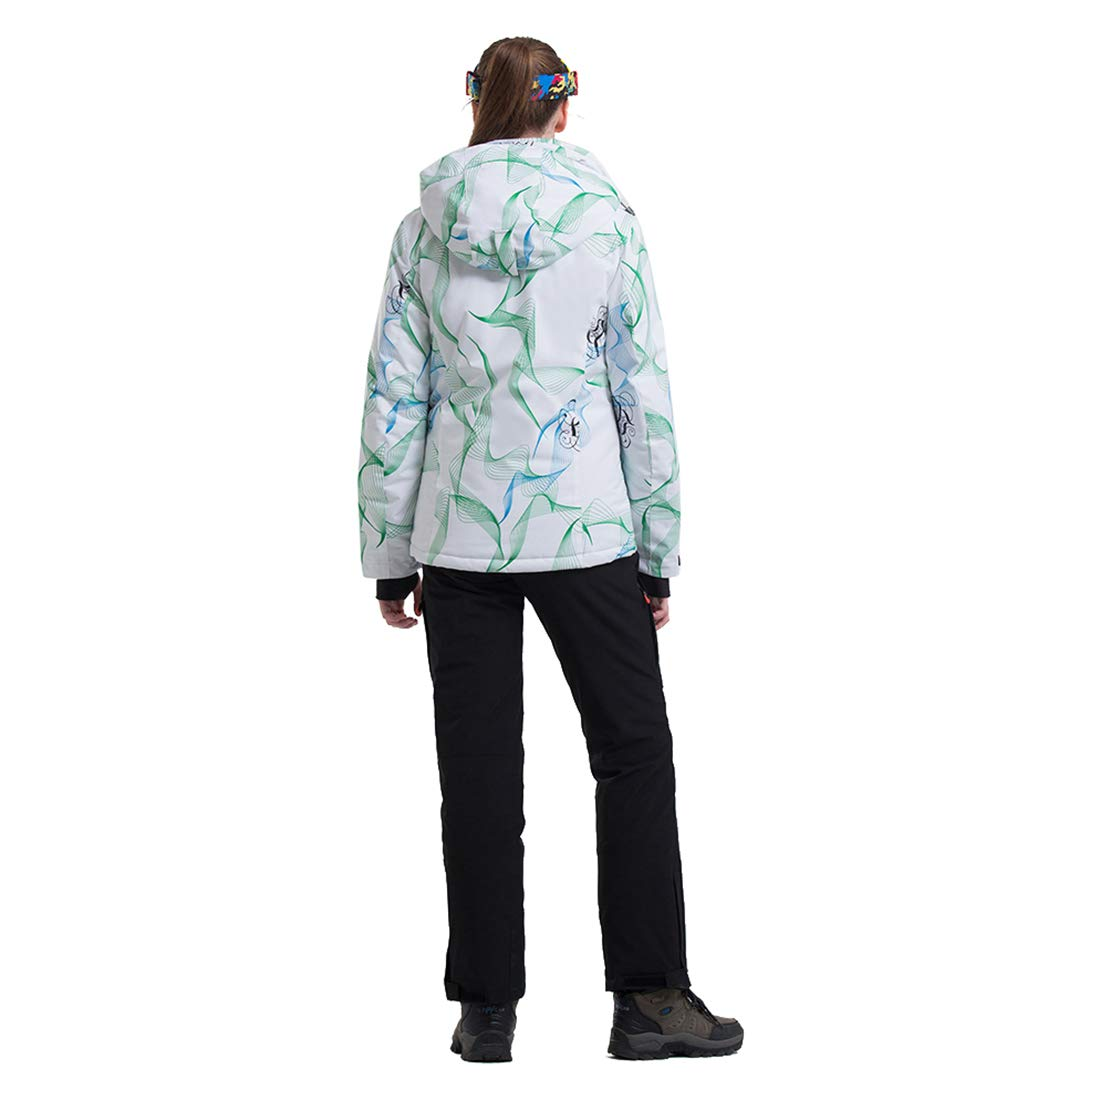 LINDANIG Giacca Giacca Giacca da Sci da Snowboard Traspirante Impermeabile da Donna (Coloree   Coloree, Dimensione   XXL)B07K2Y9YSJXXL bianca | Di Alta Qualità  | Speciale Offerta  | Up-to-date Styling  | Di Nuovi Prodotti 2019  24643e